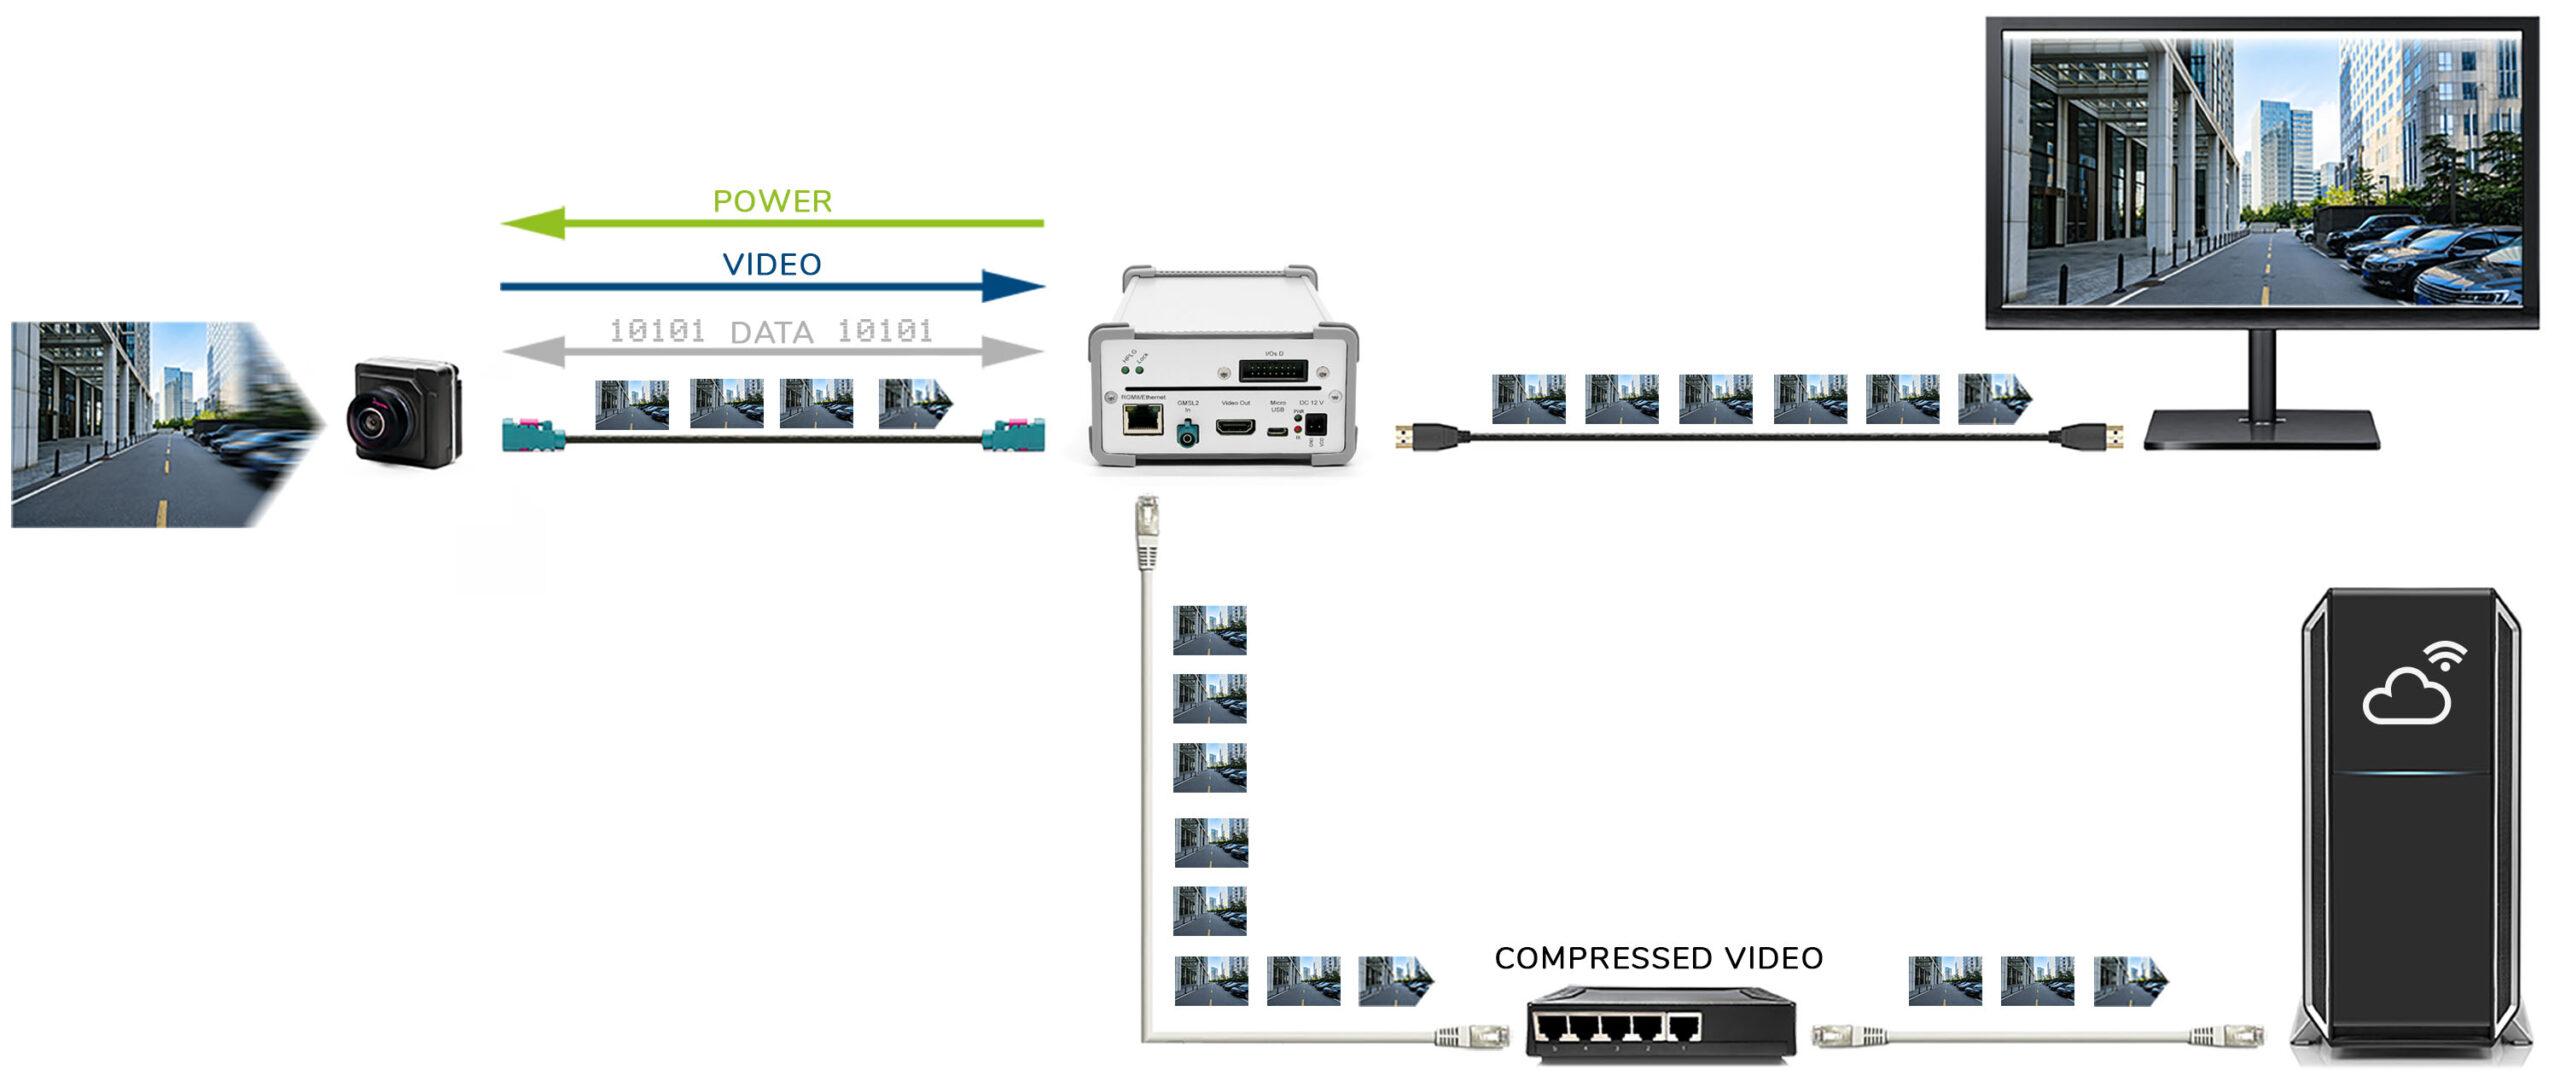 TZ Electronic Systems GmbH - SPU0080